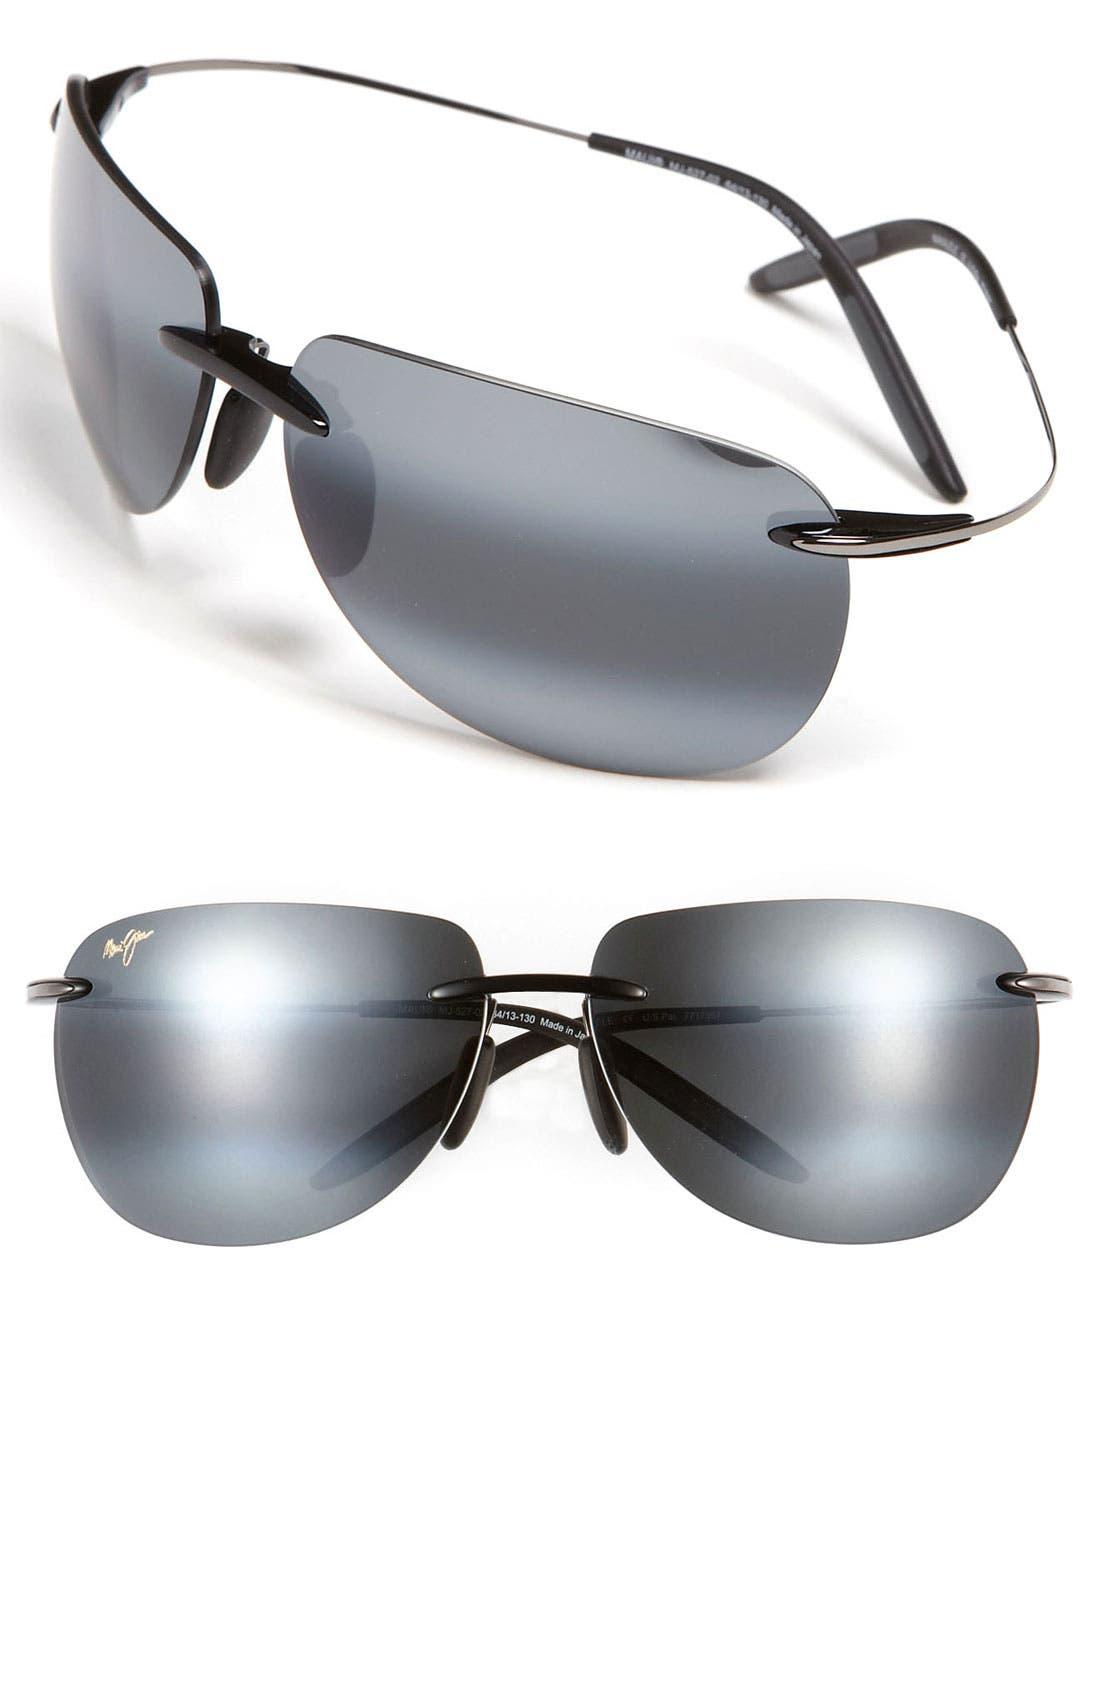 Alternate Image 1 Selected - Maui Jim 'Nakalele' PolarizedPlus®2 Rimless 64mm Sunglasses